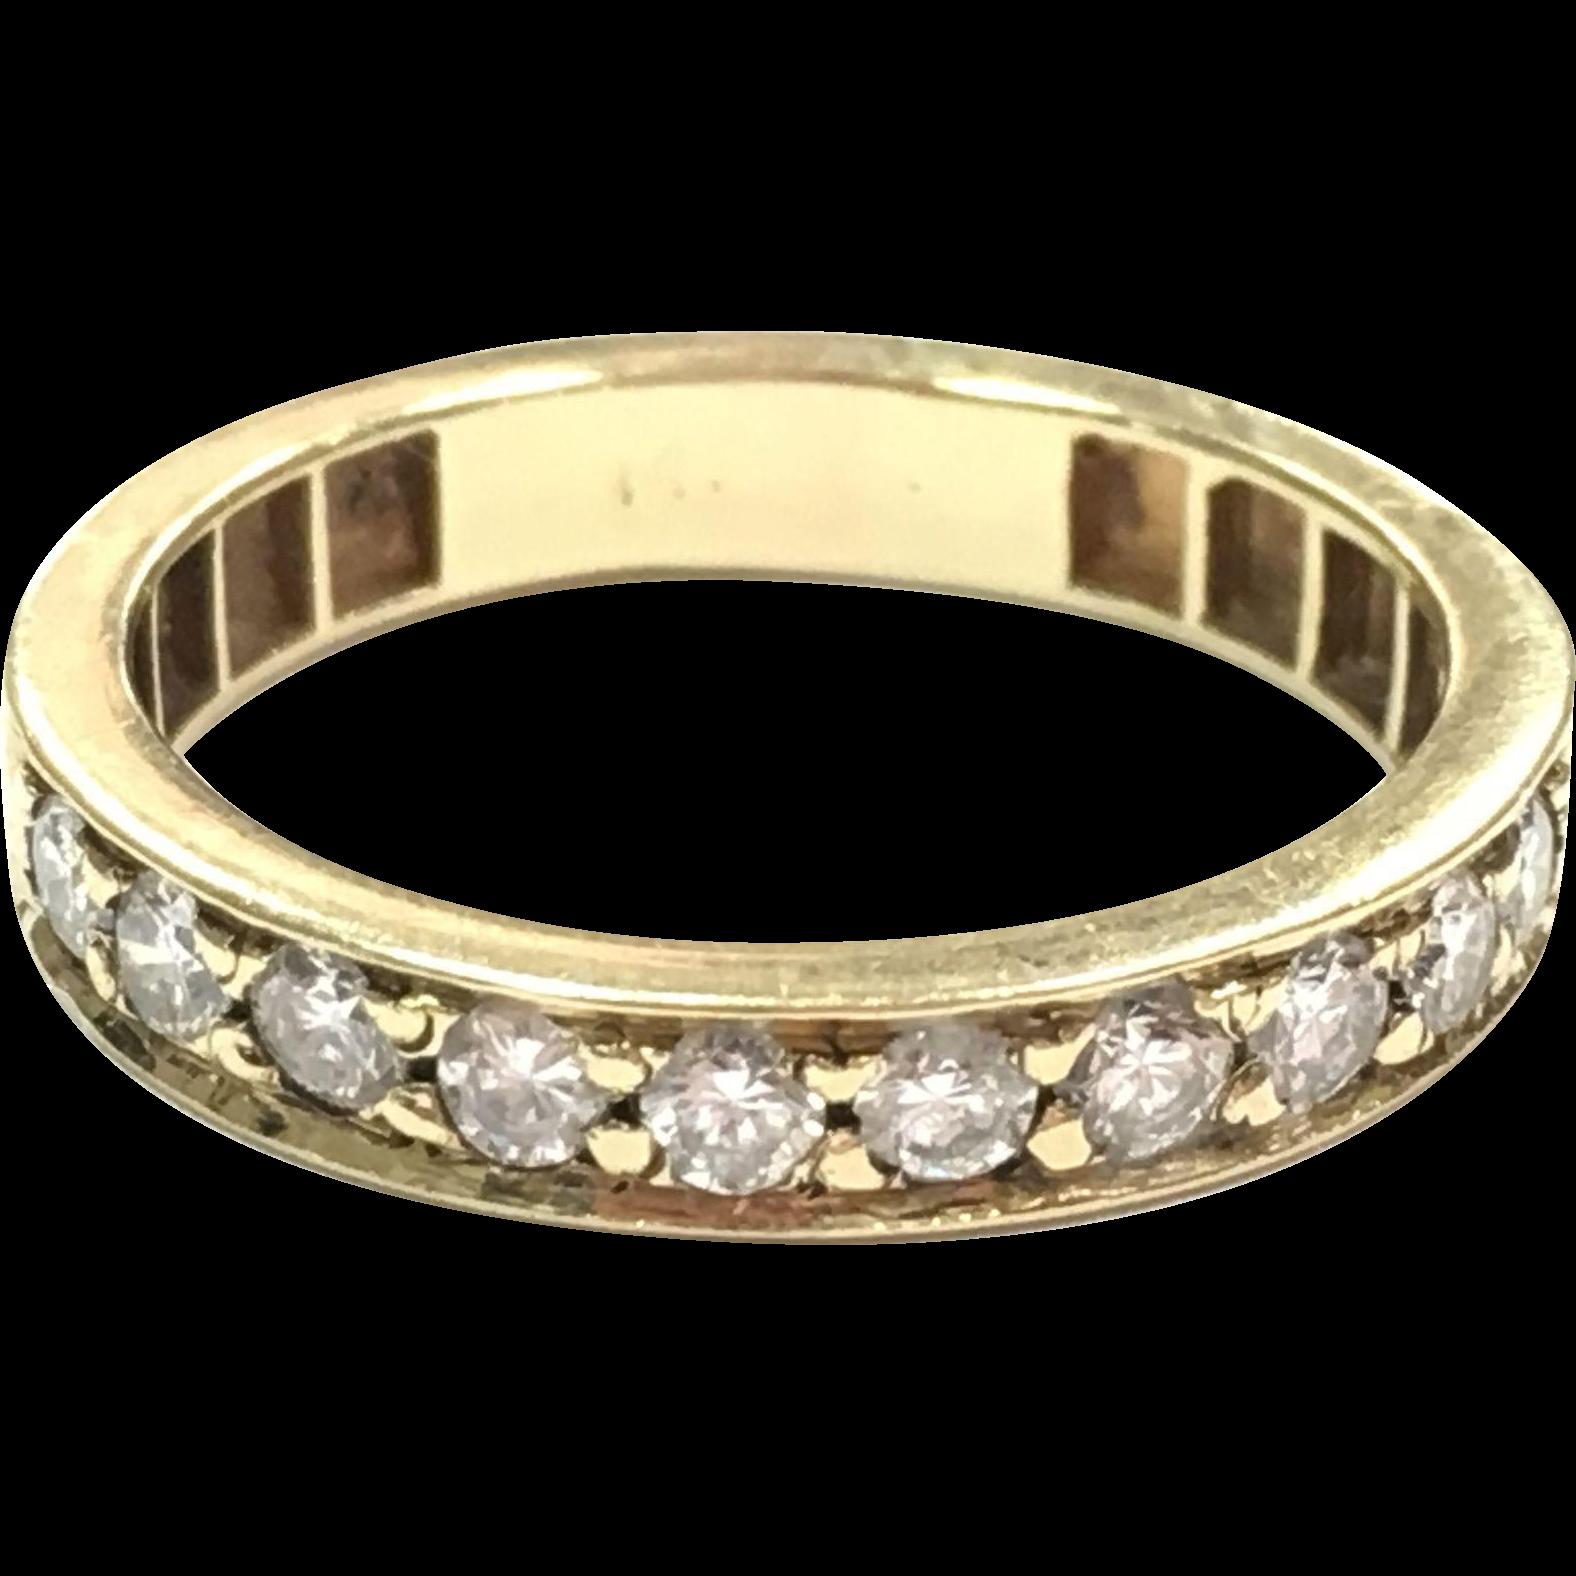 Vintage 14K yellow gold 10 diamond stacking wedding band